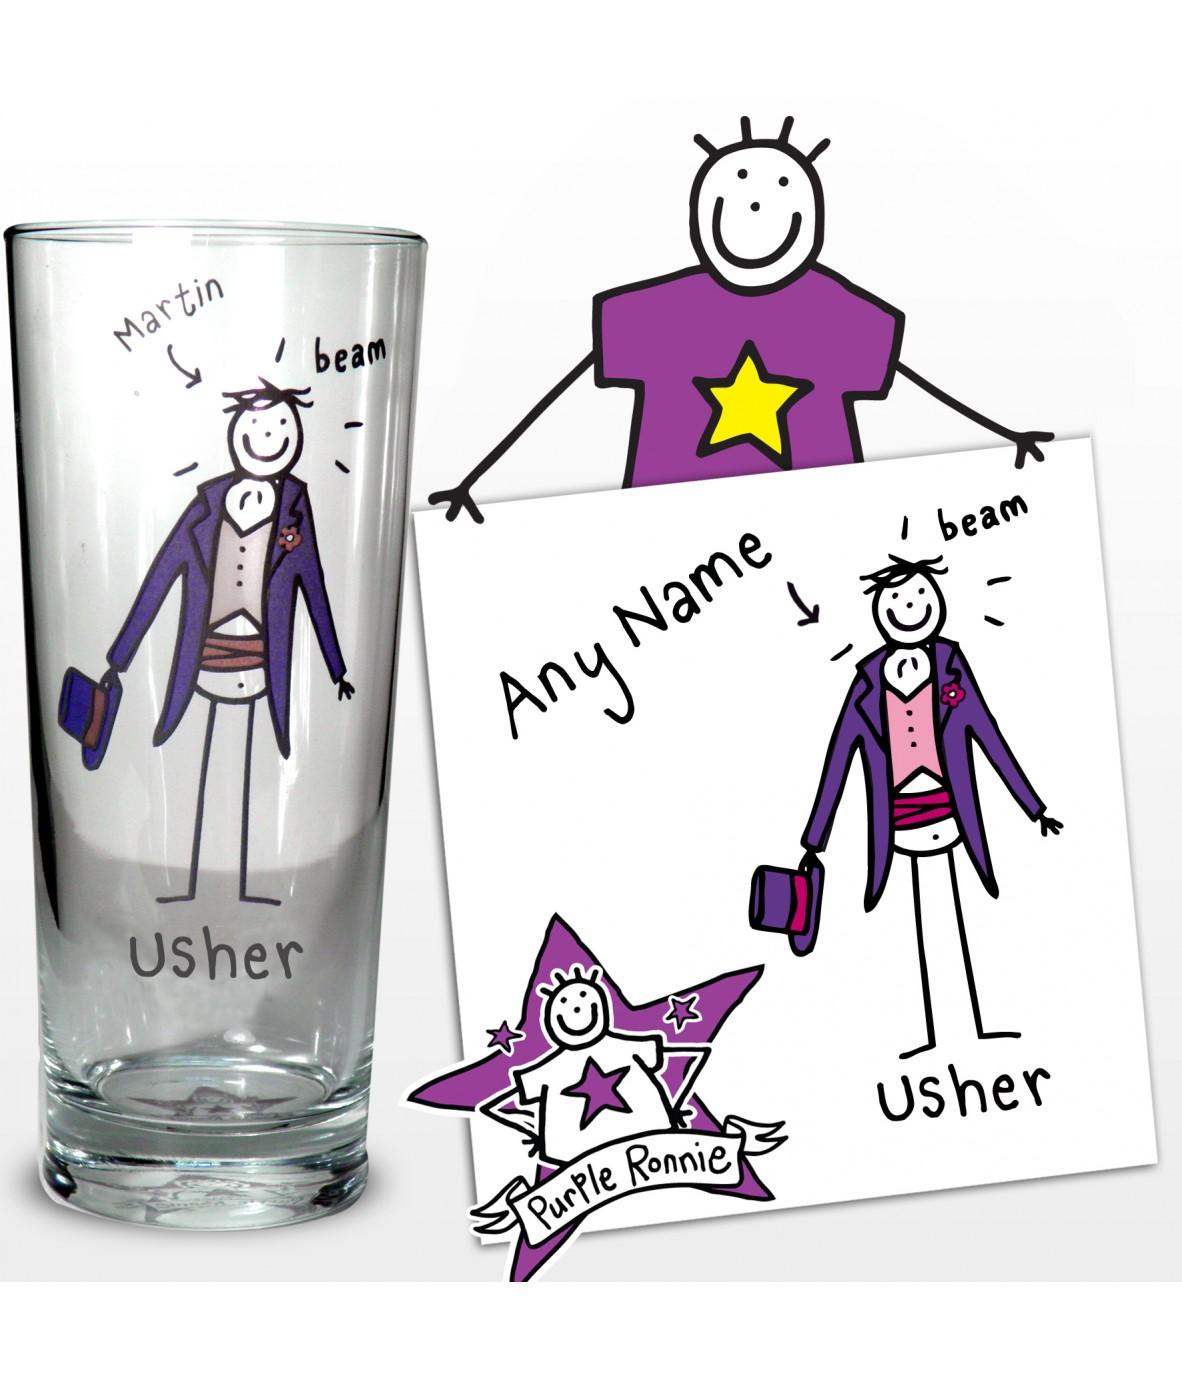 Personalised Wedding Usher Gifts : Personalised Pilsner GlassPurple Ronnie (WeddingUsher)Just ...